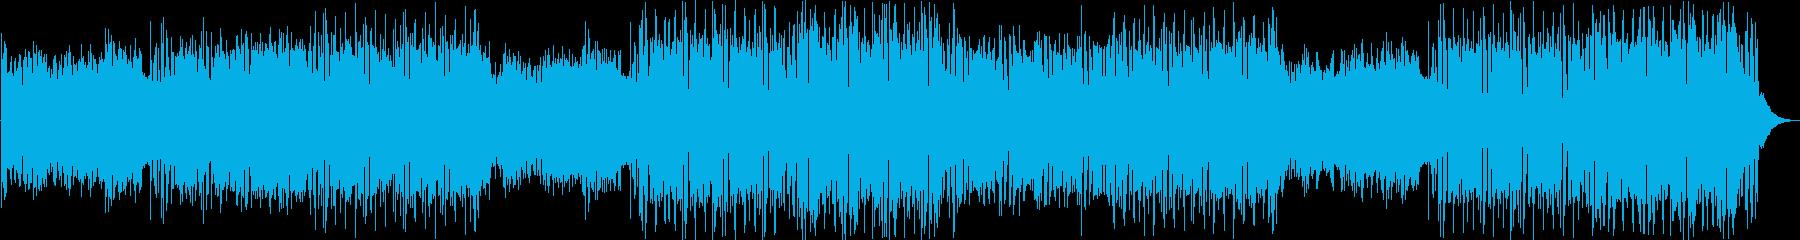 KPOP・スタイリッシュなEDMファンクの再生済みの波形